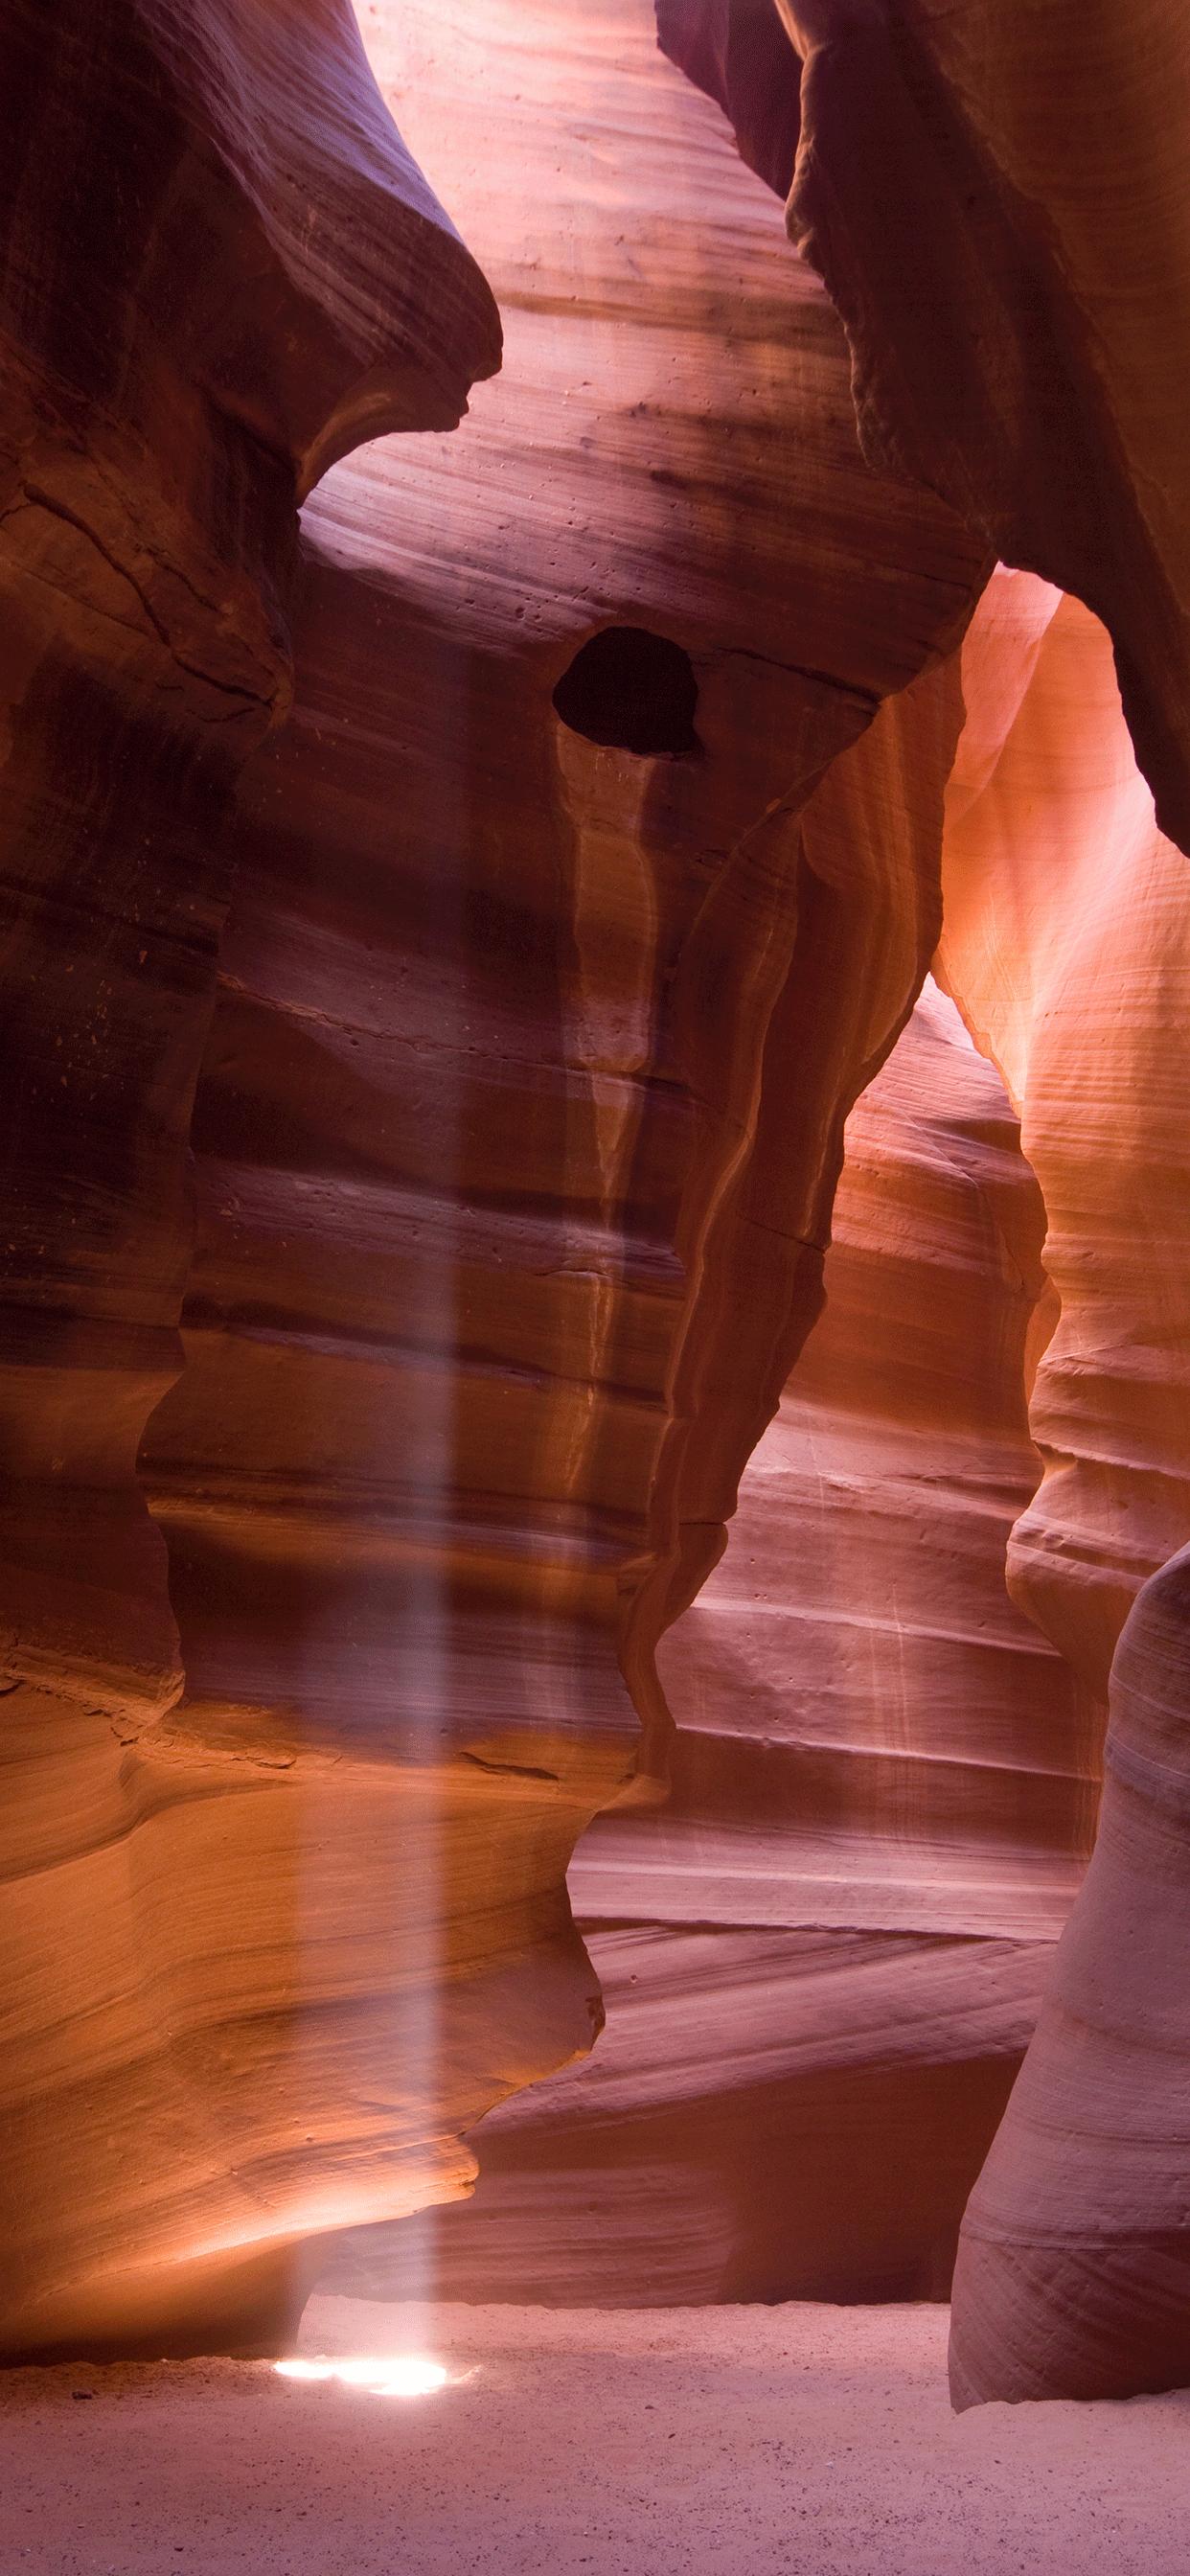 iPhone wallpaper antelope canyon c Fonds d'écran iPhone du 17/04/2019